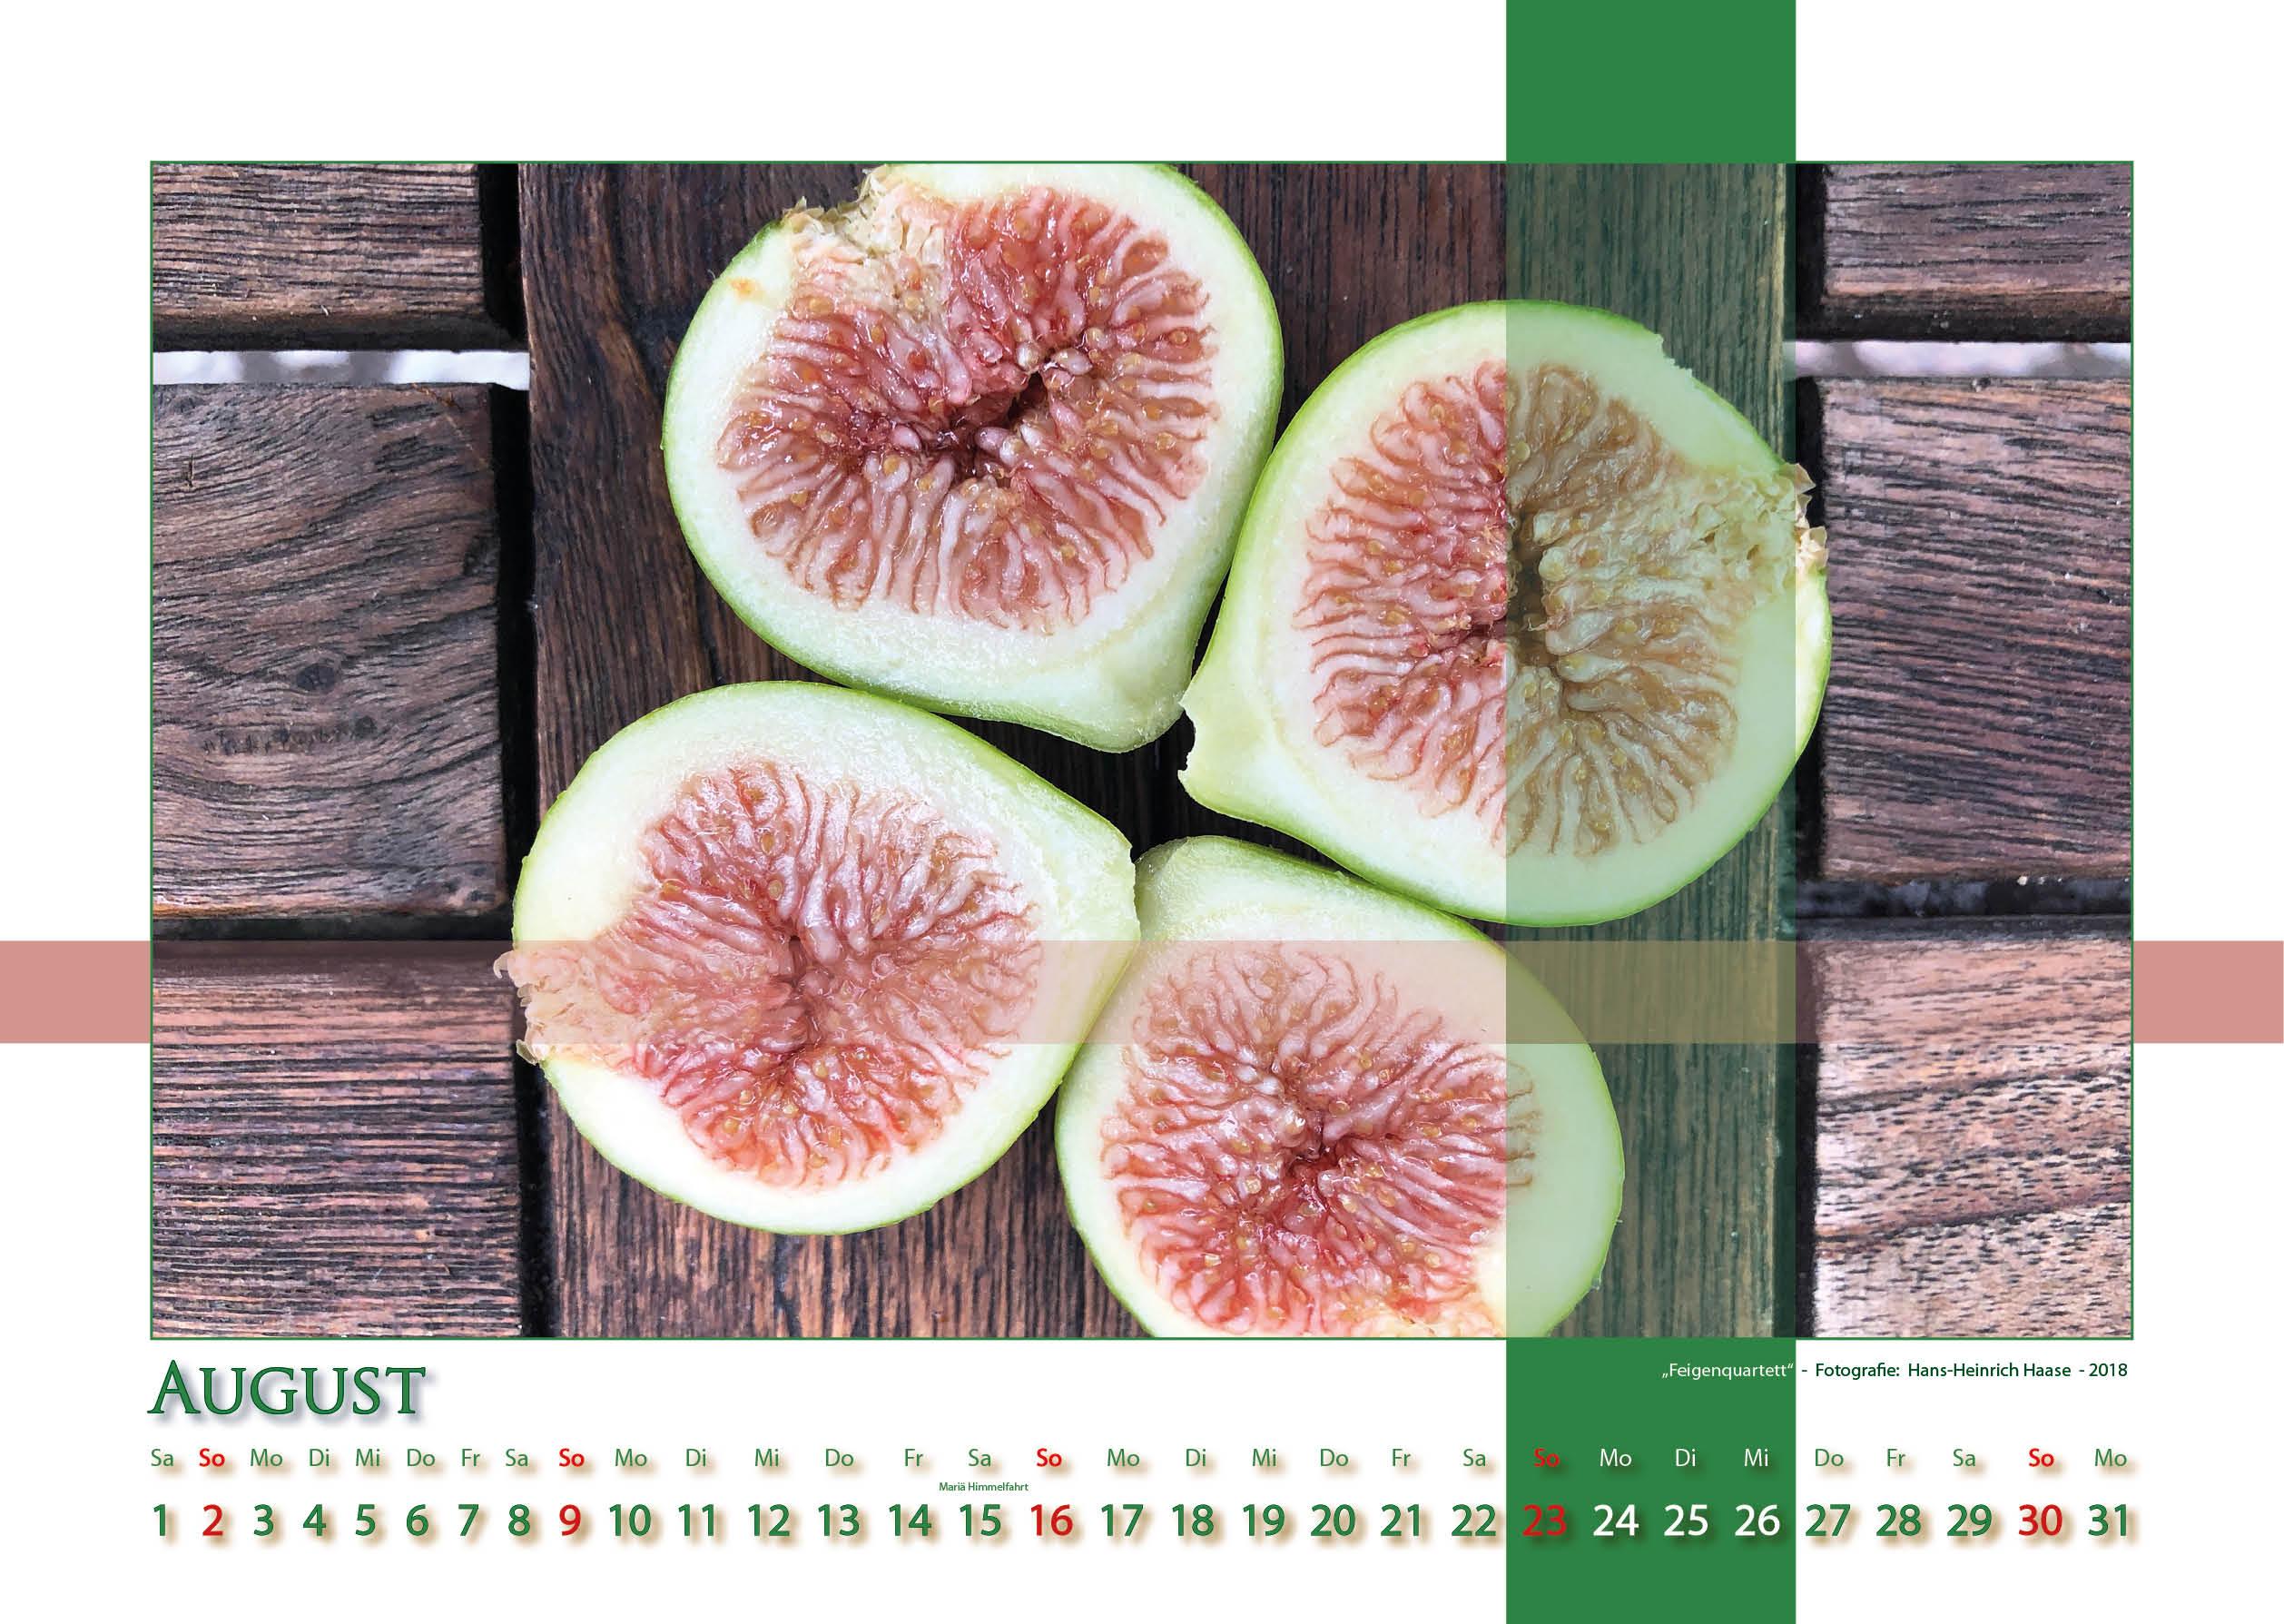 Feigenquartett - Strukturen - Kalender 2020 © Katharina Hansen-Gluschitz